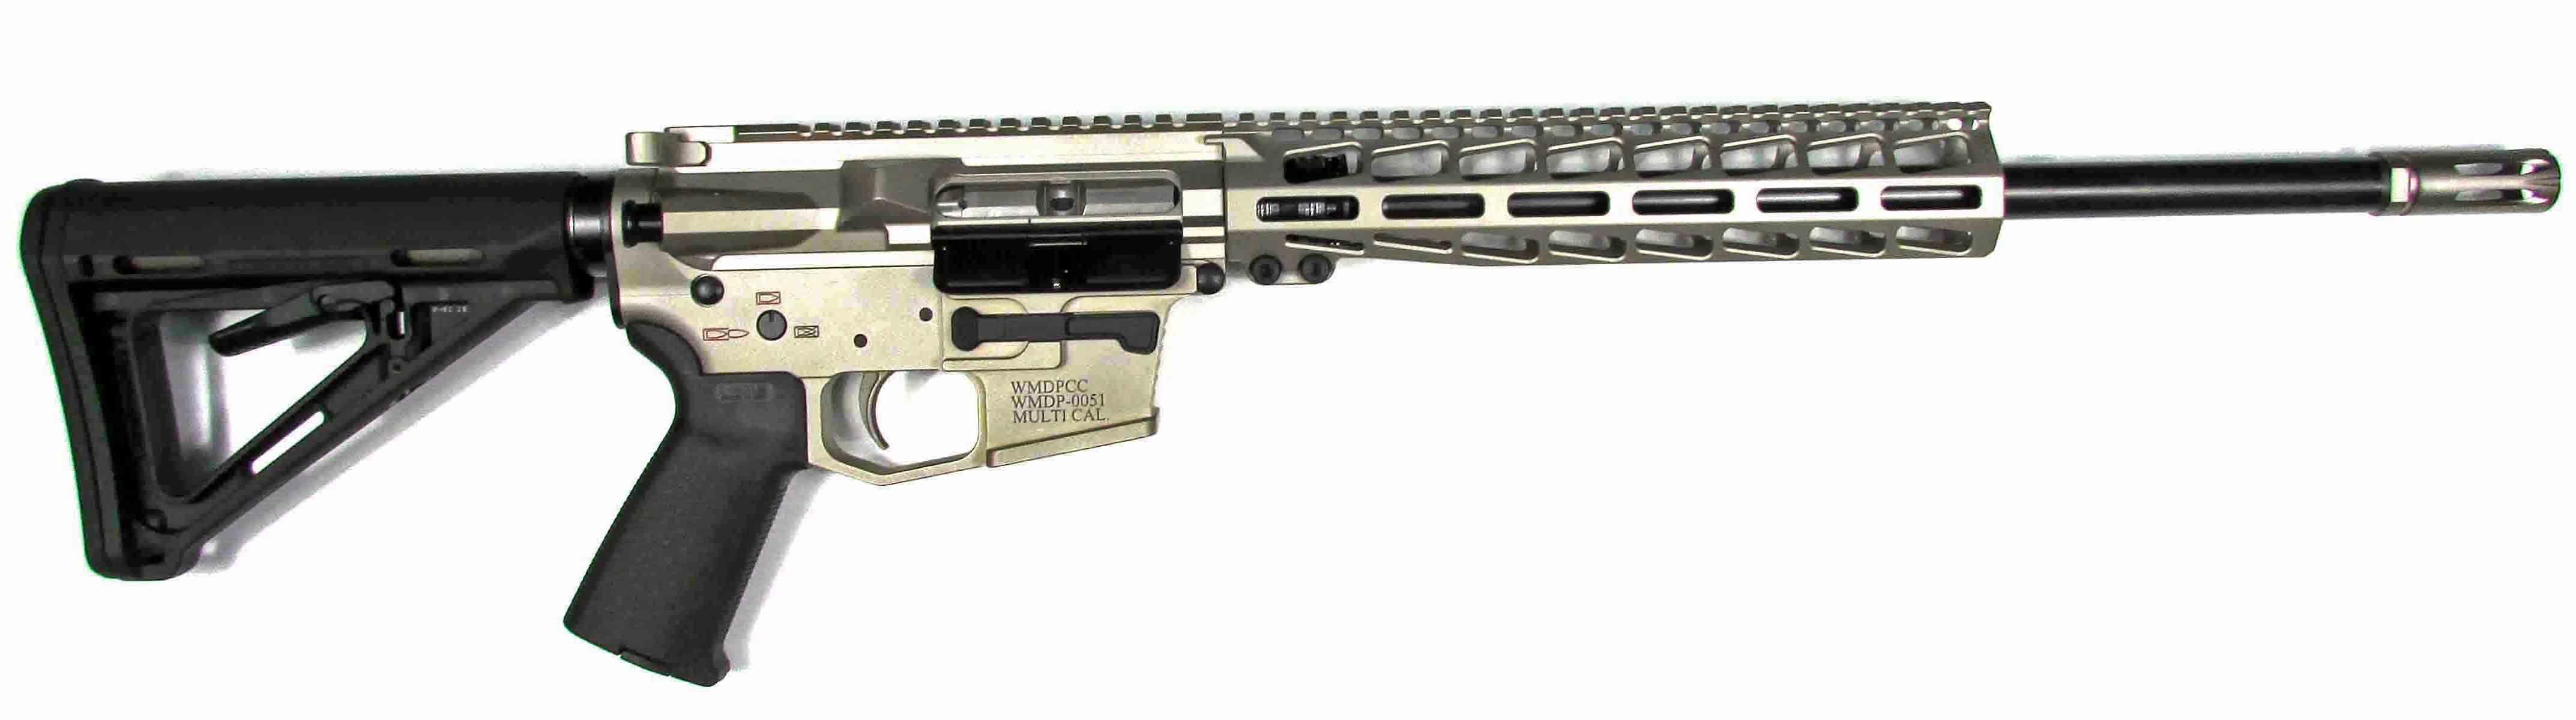 9mm Rifles